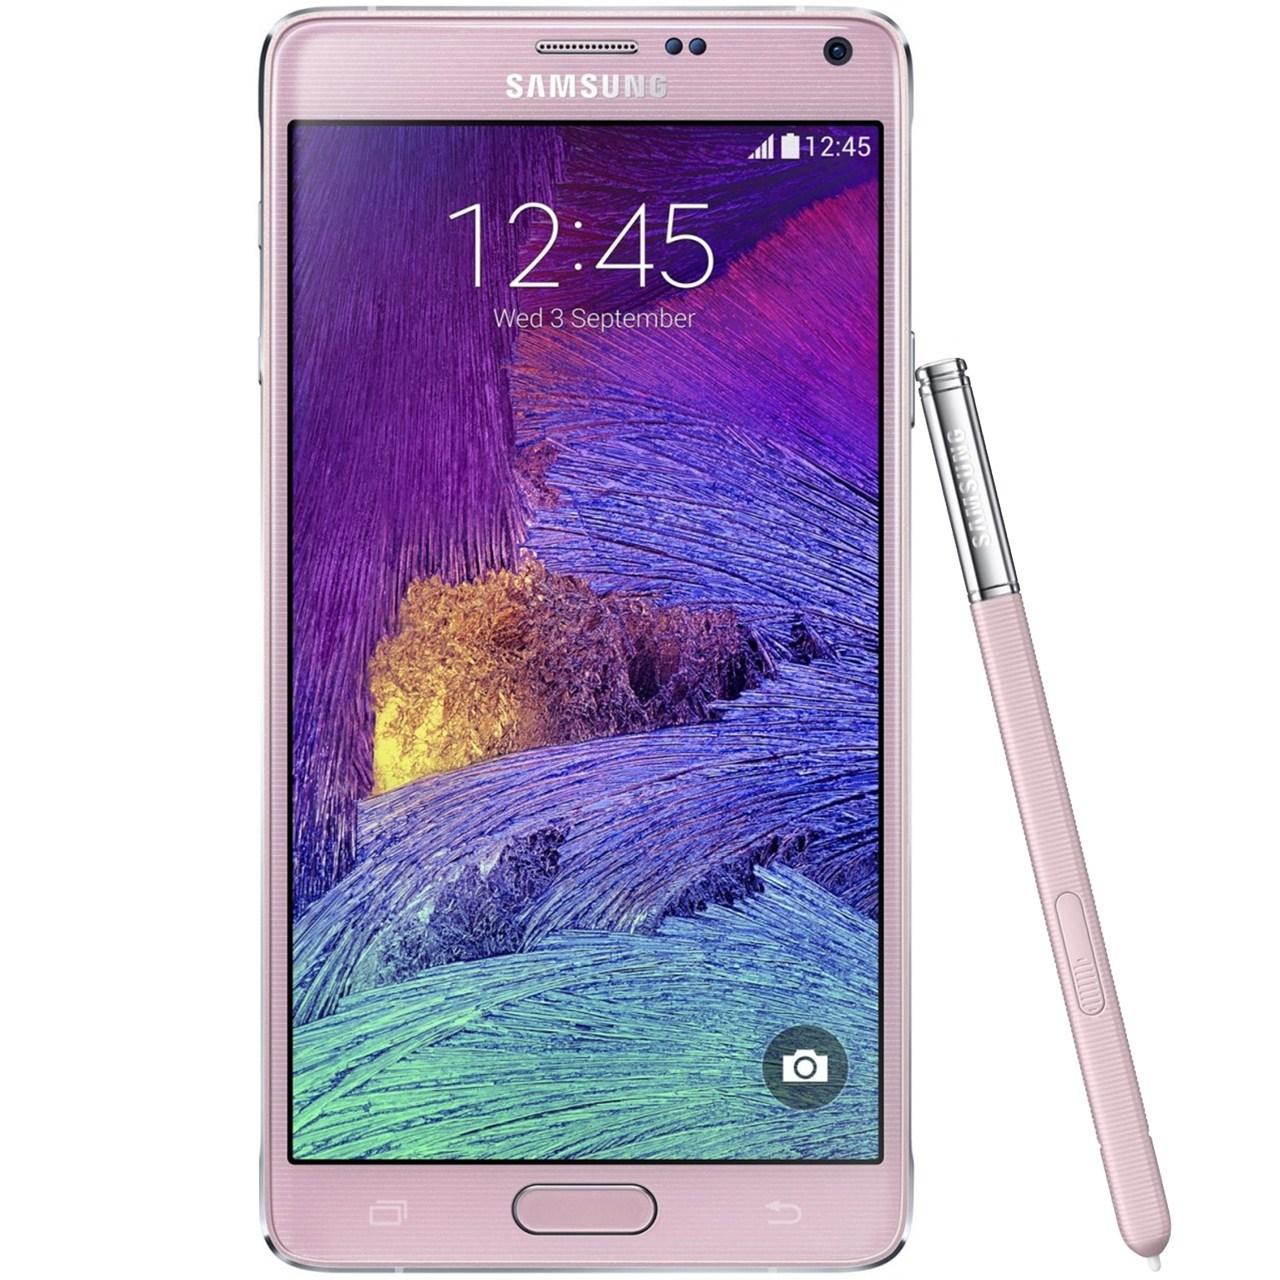 گوشی موبایل سامسونگ مدل Galaxy Note 4 N910C - 4G